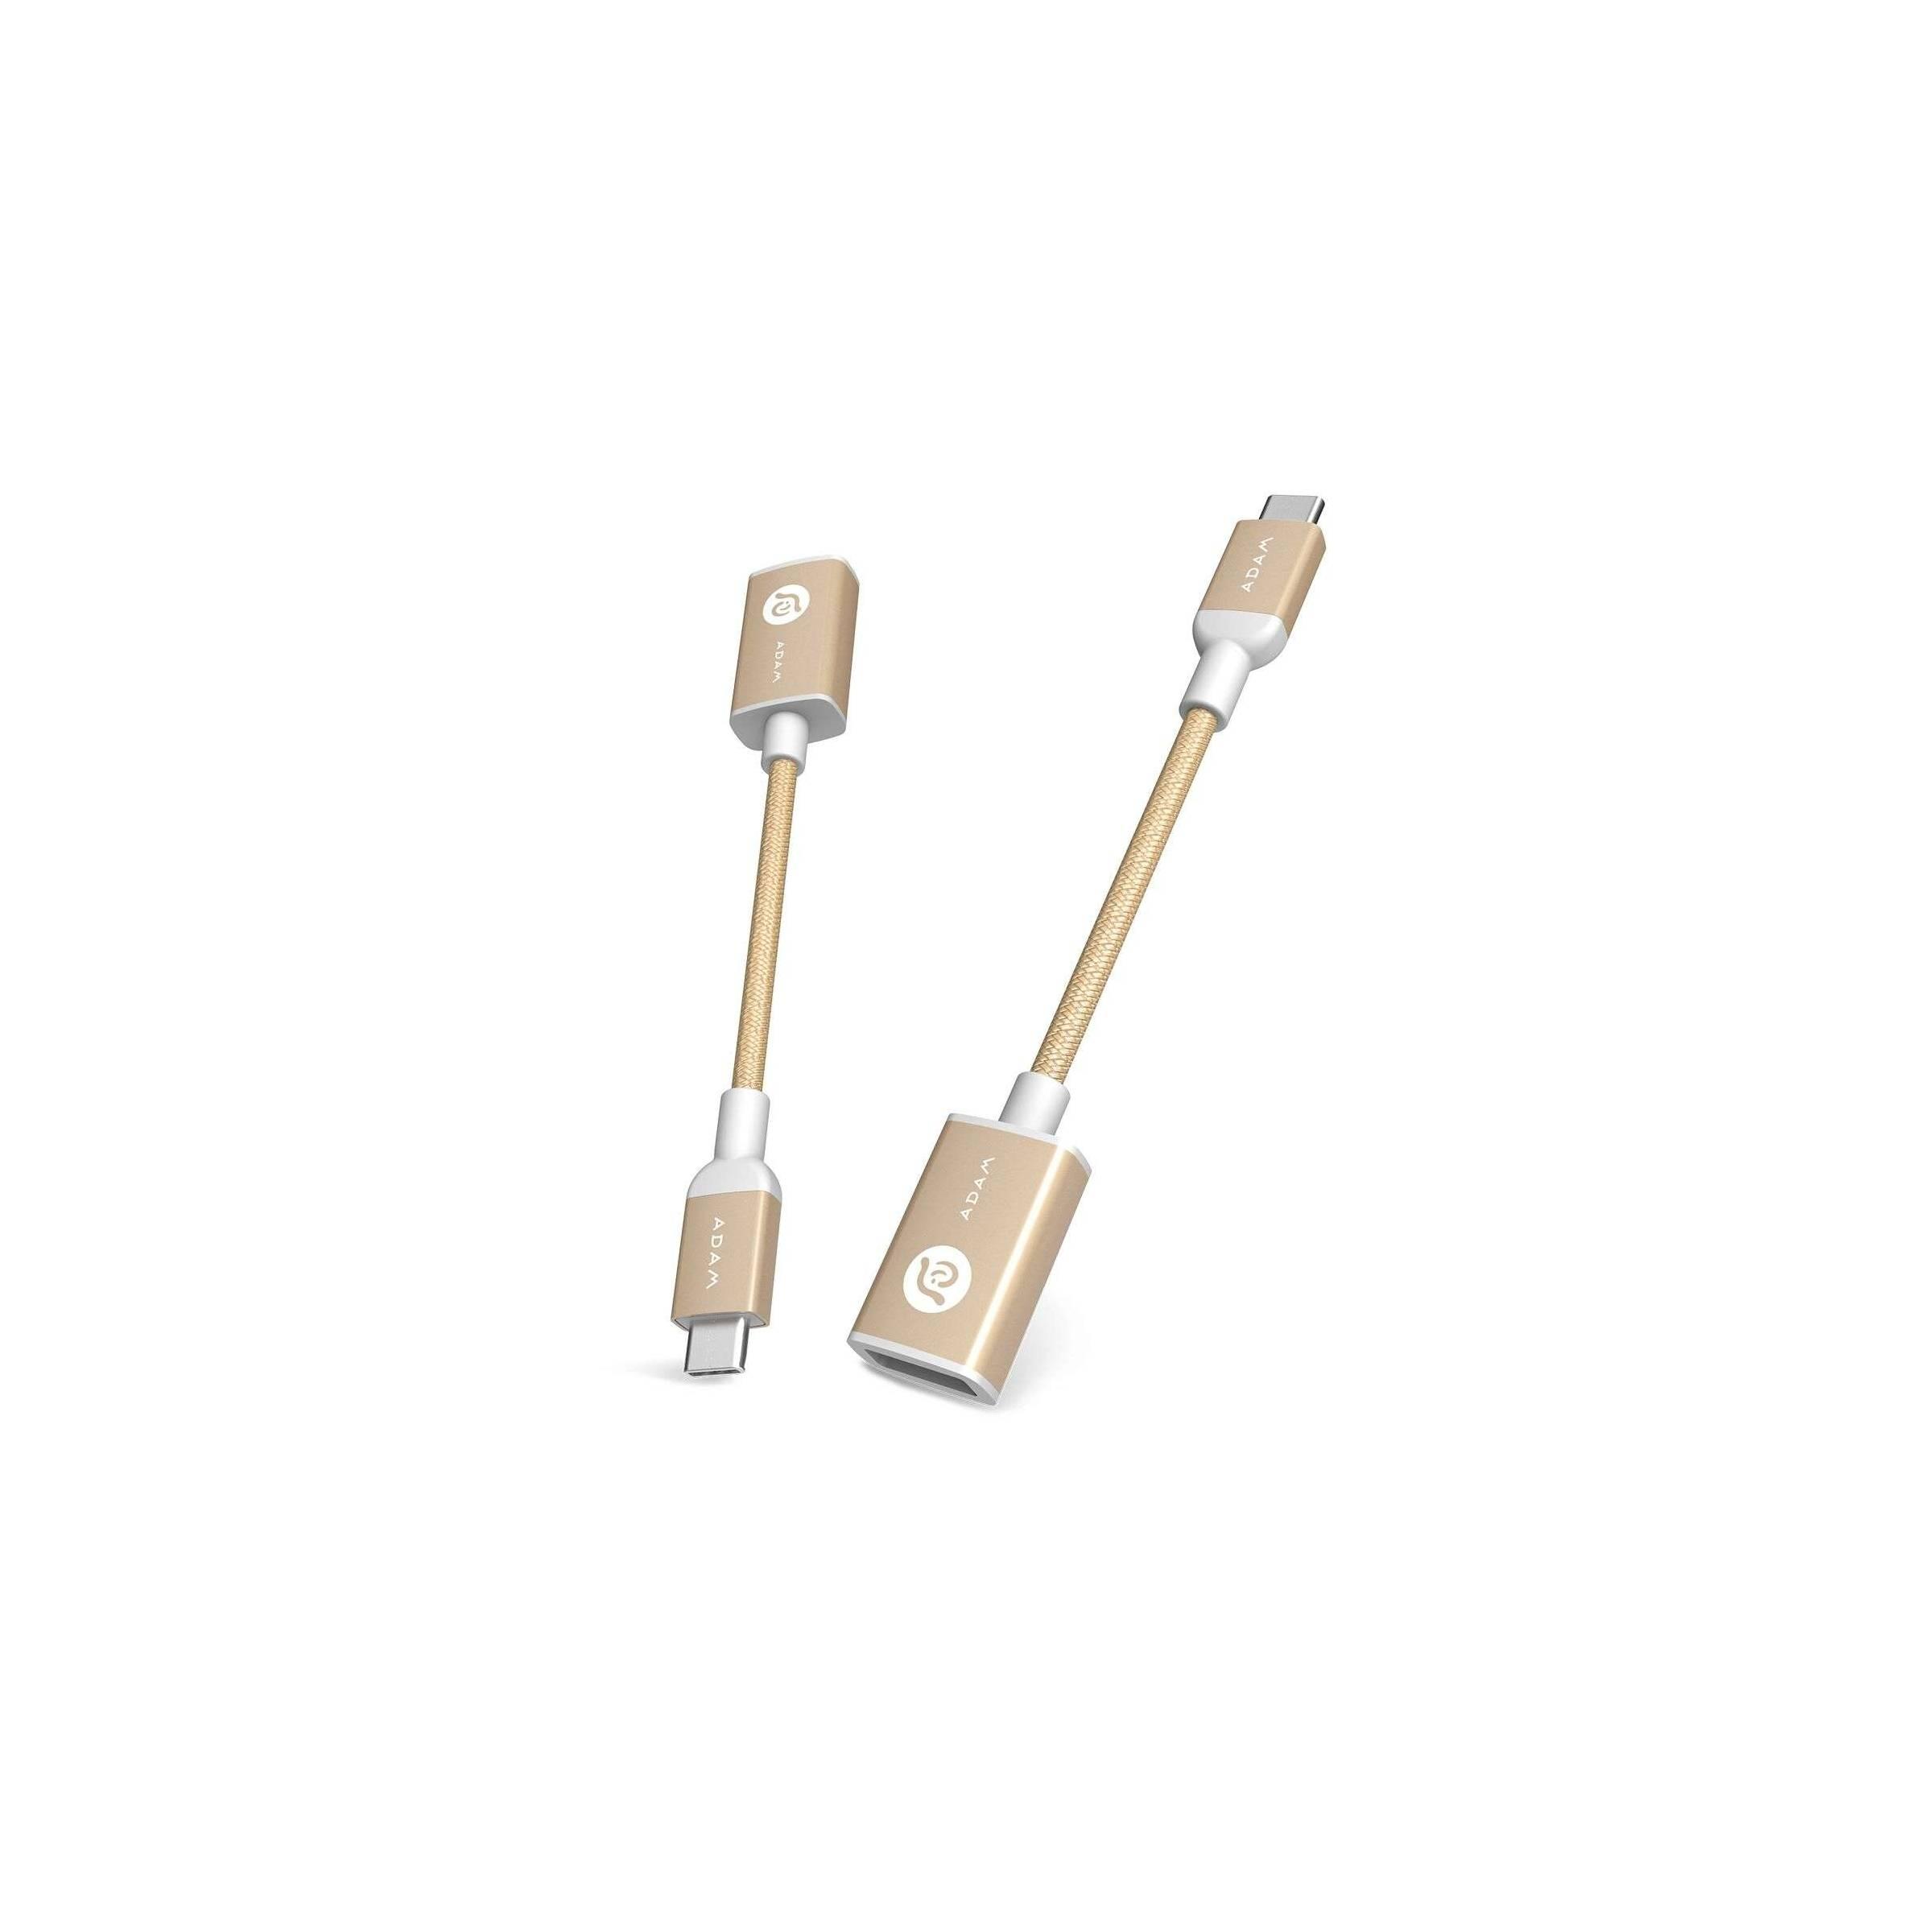 Adam elements casa f13 usb-c til usb-a adapter grå/rosegold/guld farve guld fra adam elements fra mackabler.dk